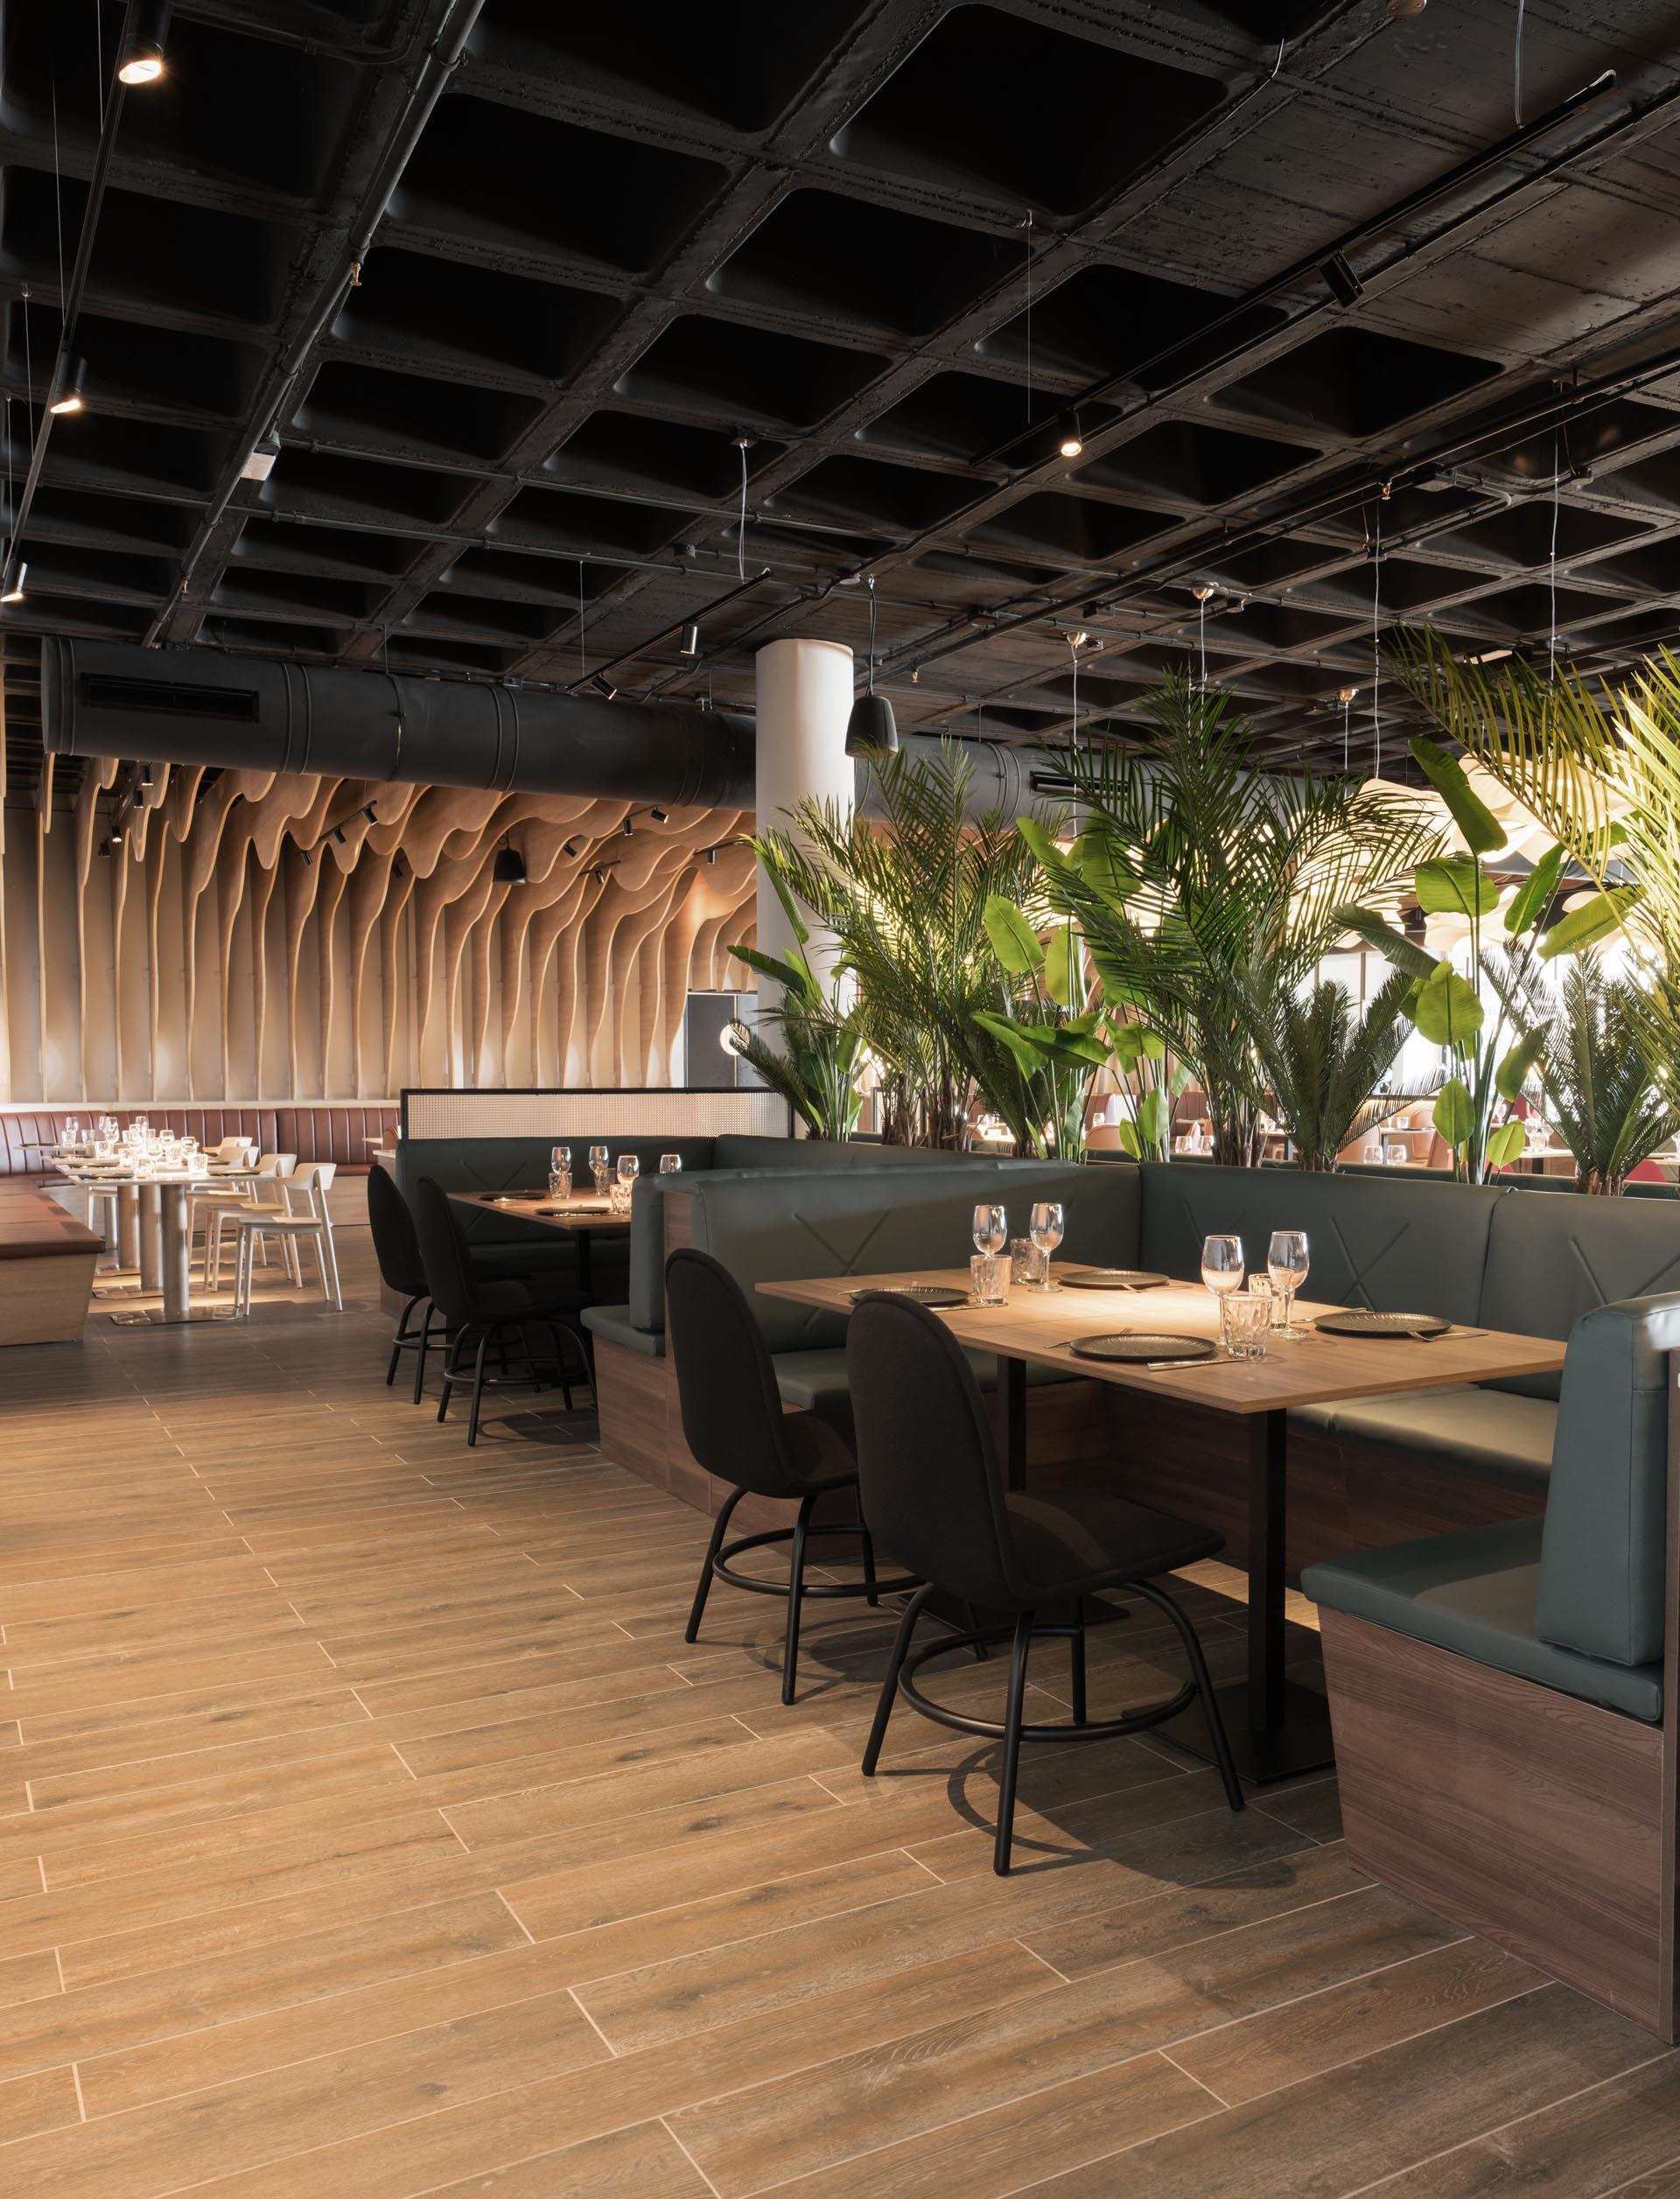 A modern restaurant with sculptural wood fins and black details.